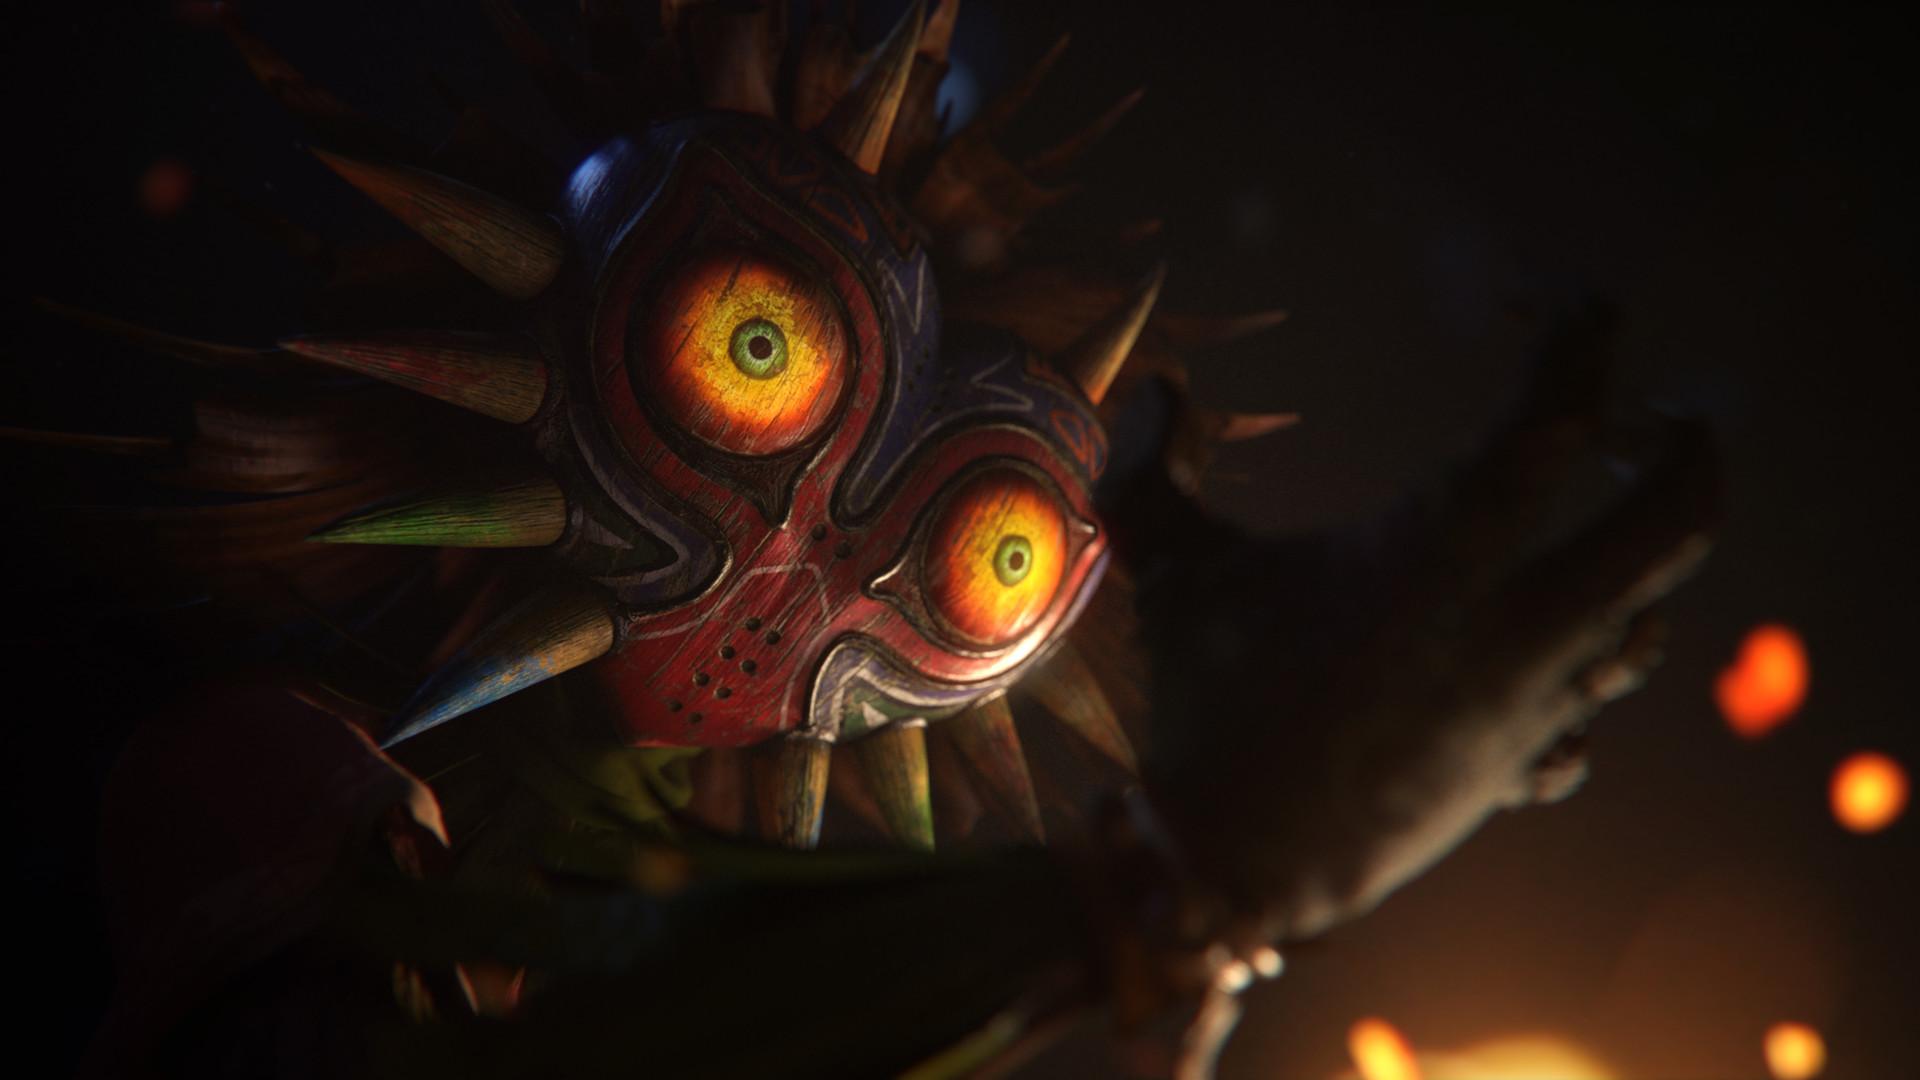 Released teaser art render